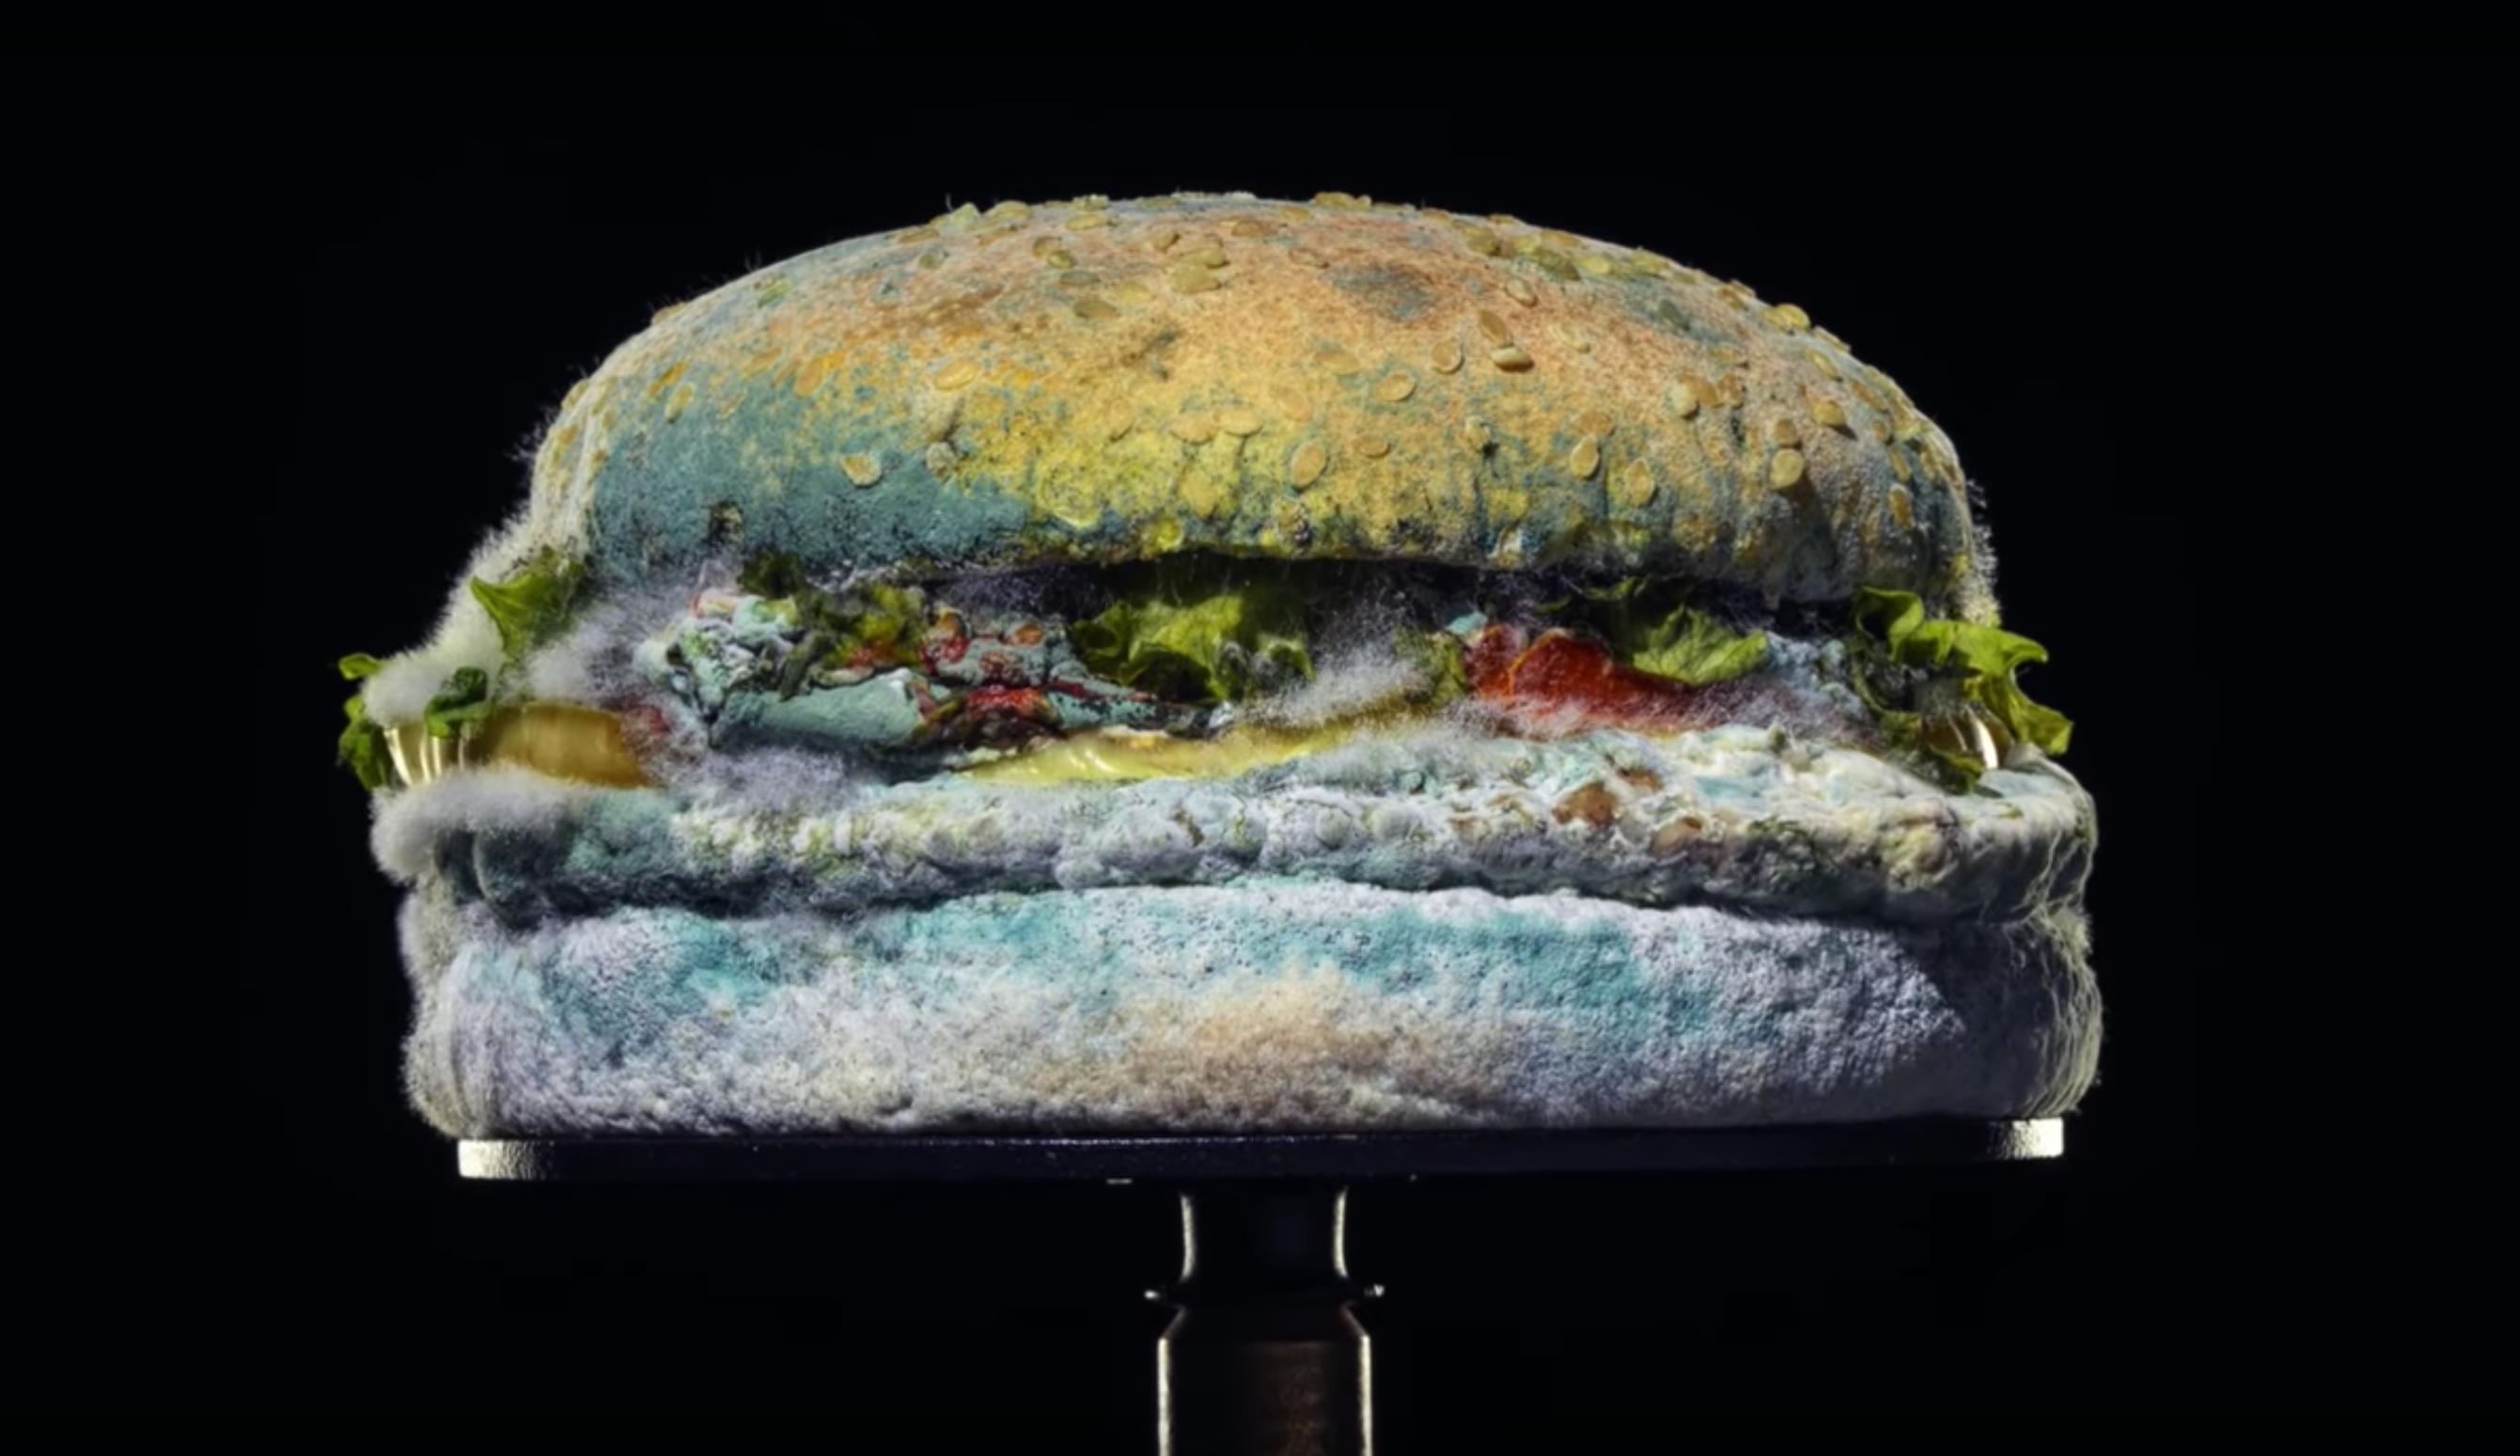 A moldy Burger King Whopper sandwich.